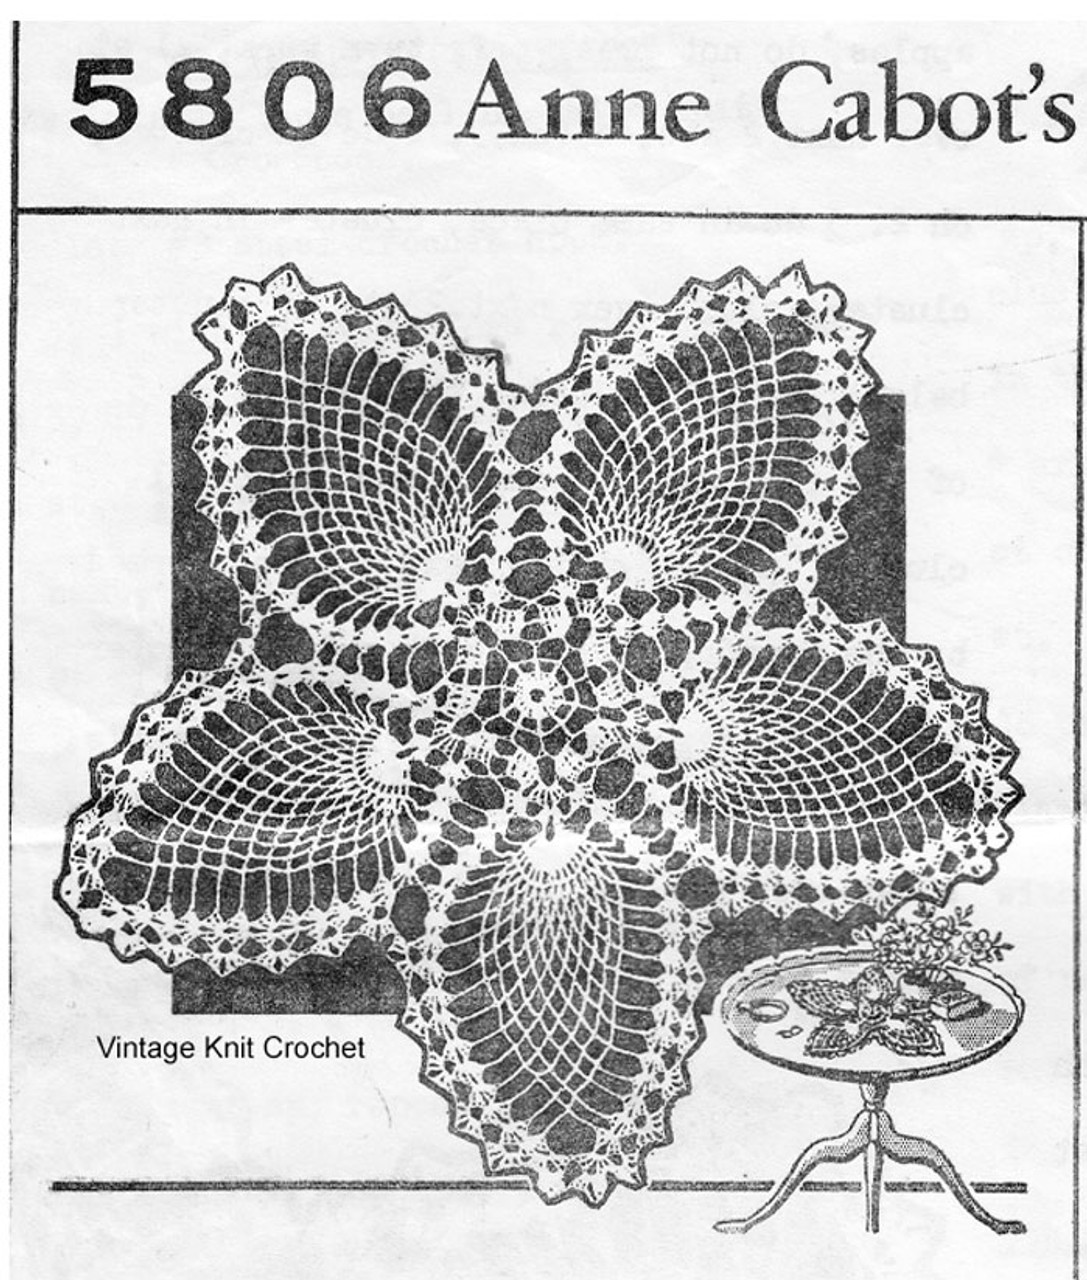 Pineapple Star Crochet Doily Pattern, Anne Cabot 5806